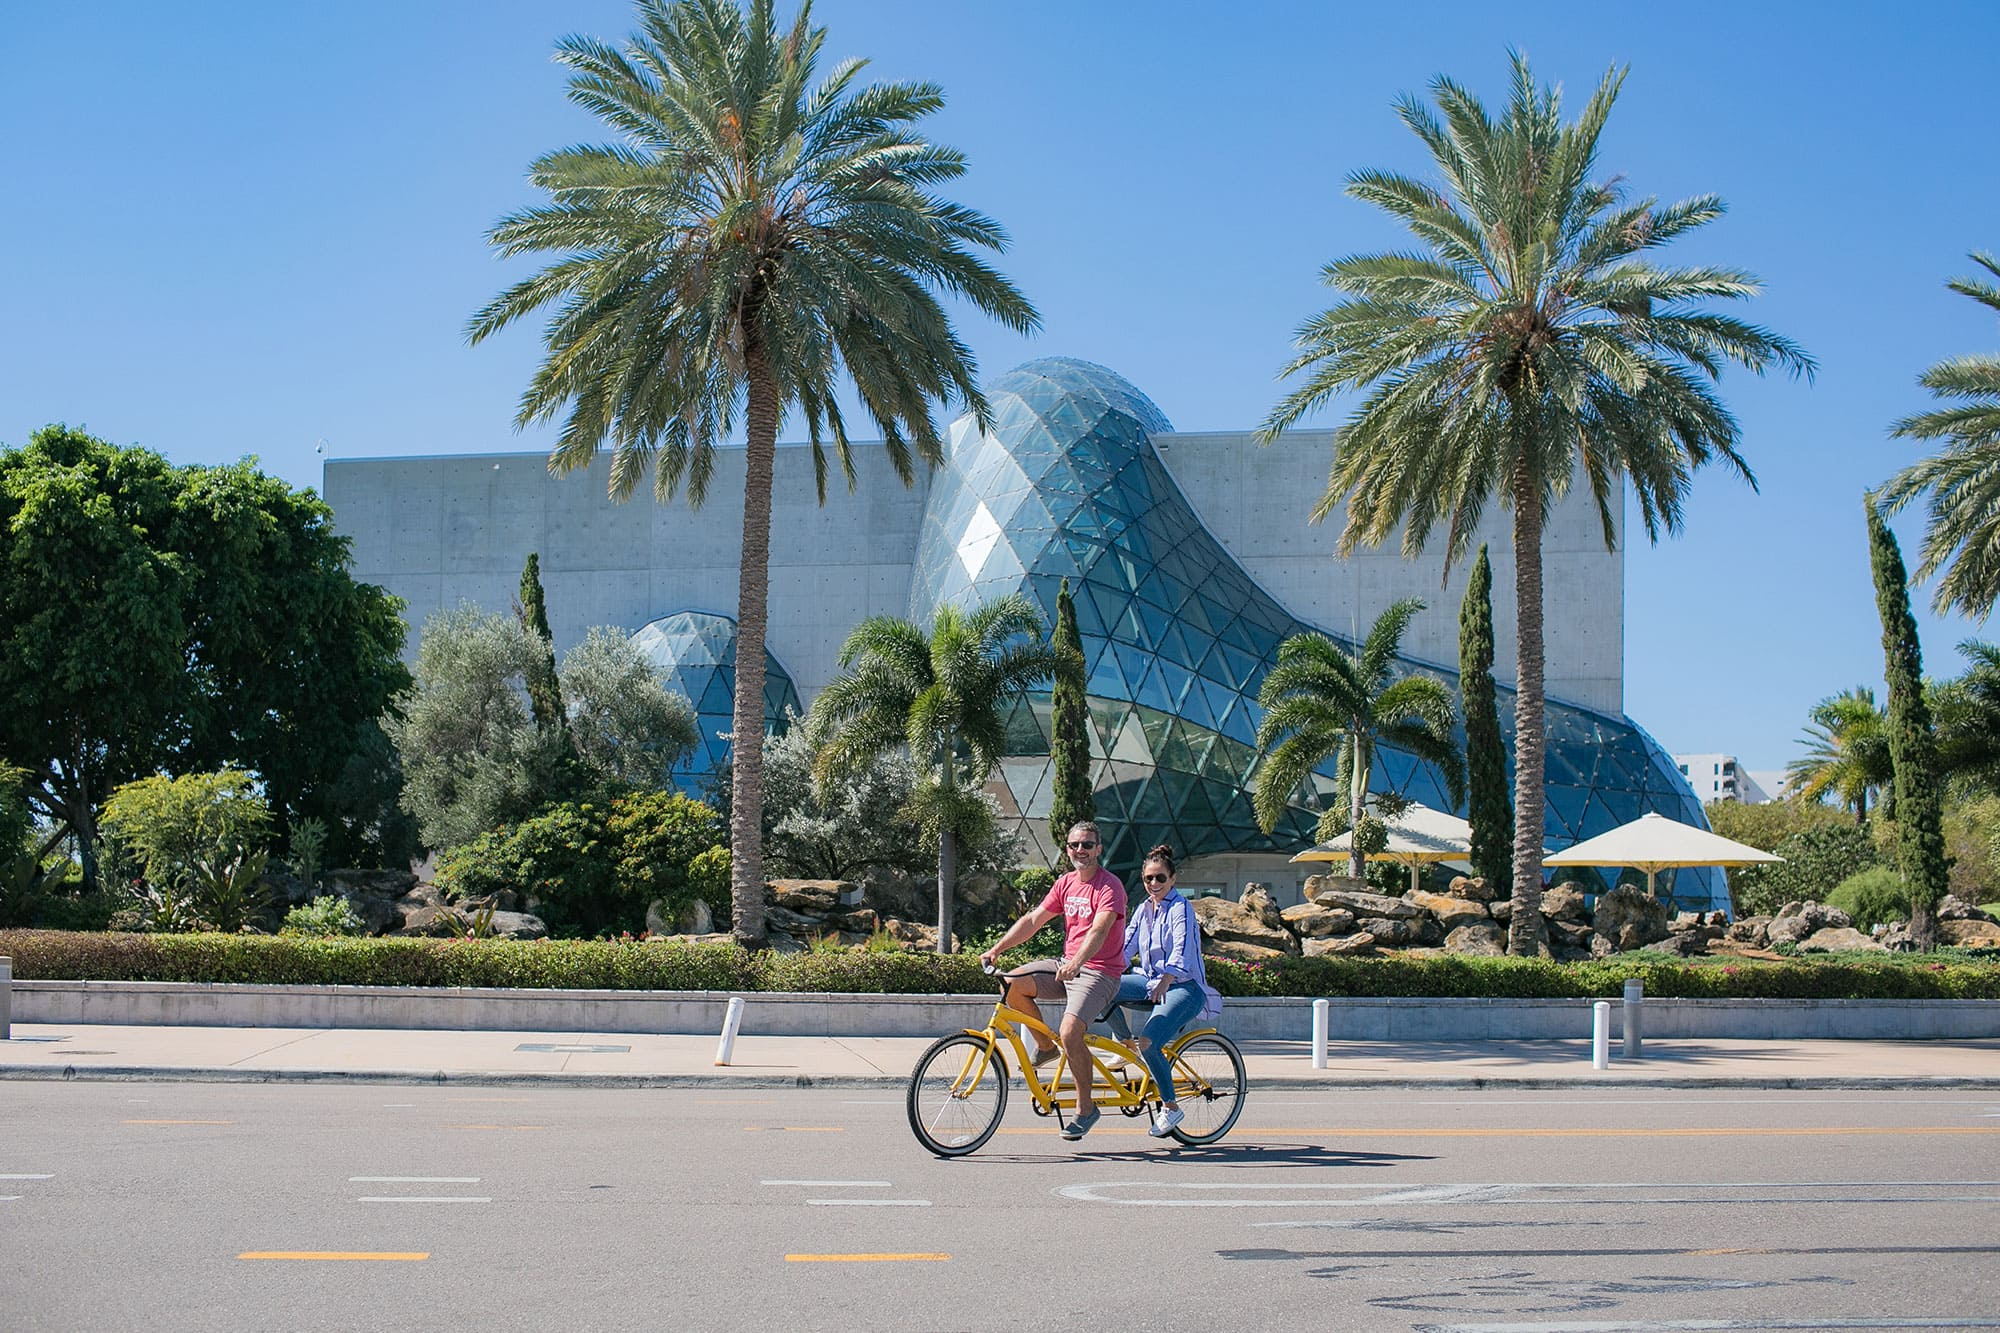 Dali Museum St Petersburg FL